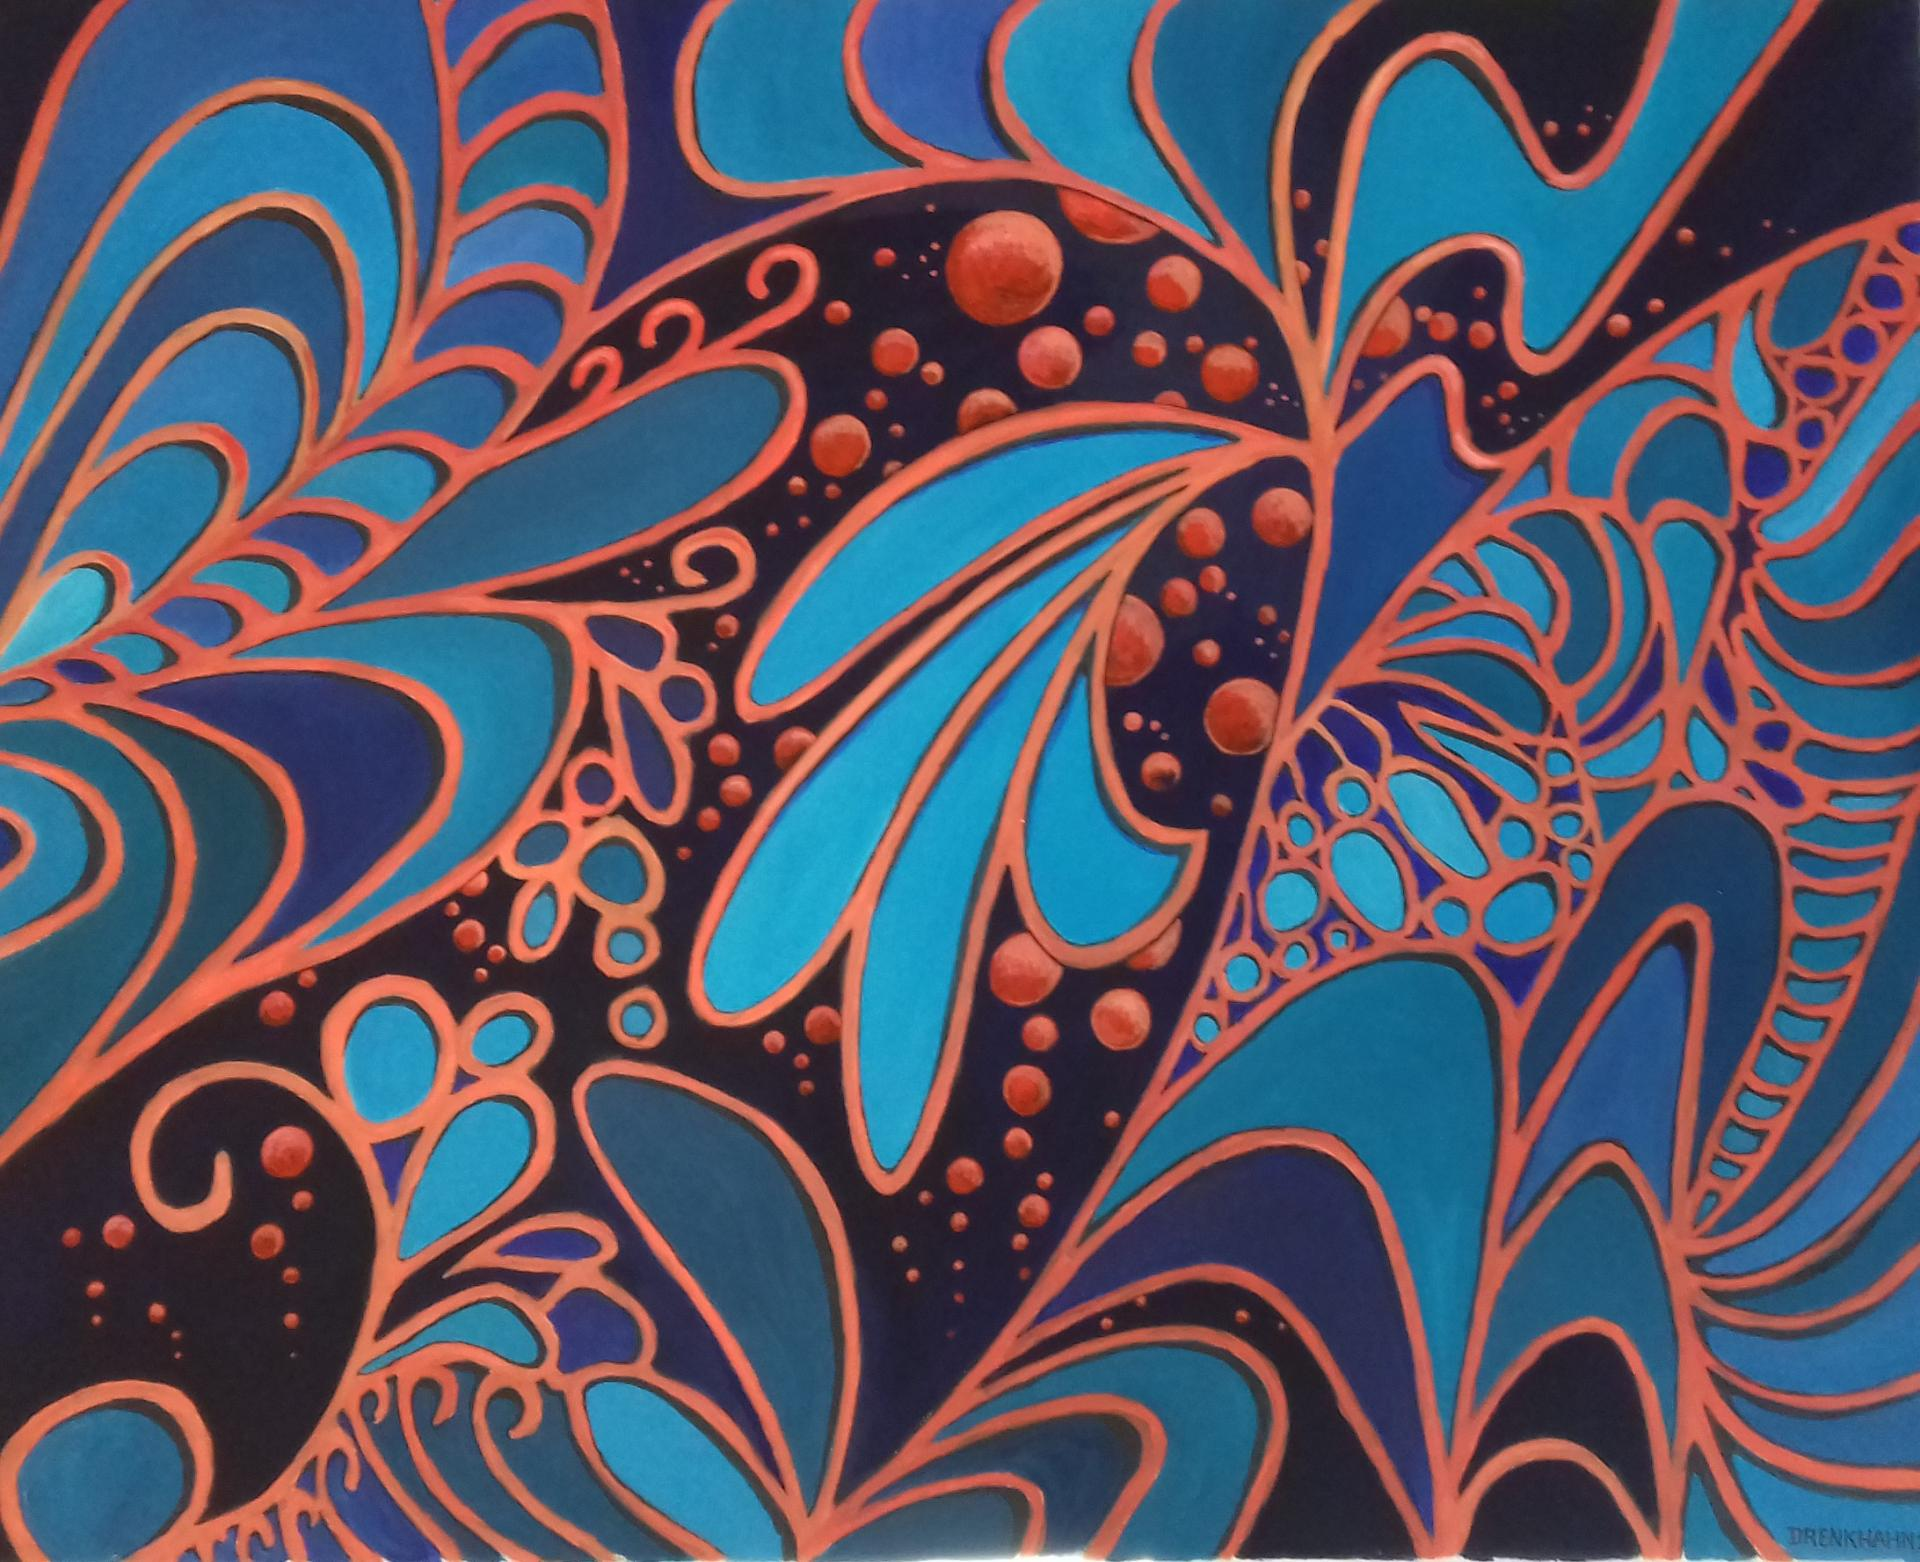 Universum   2020  Acryl auf Leinwand   80 x 100 cm